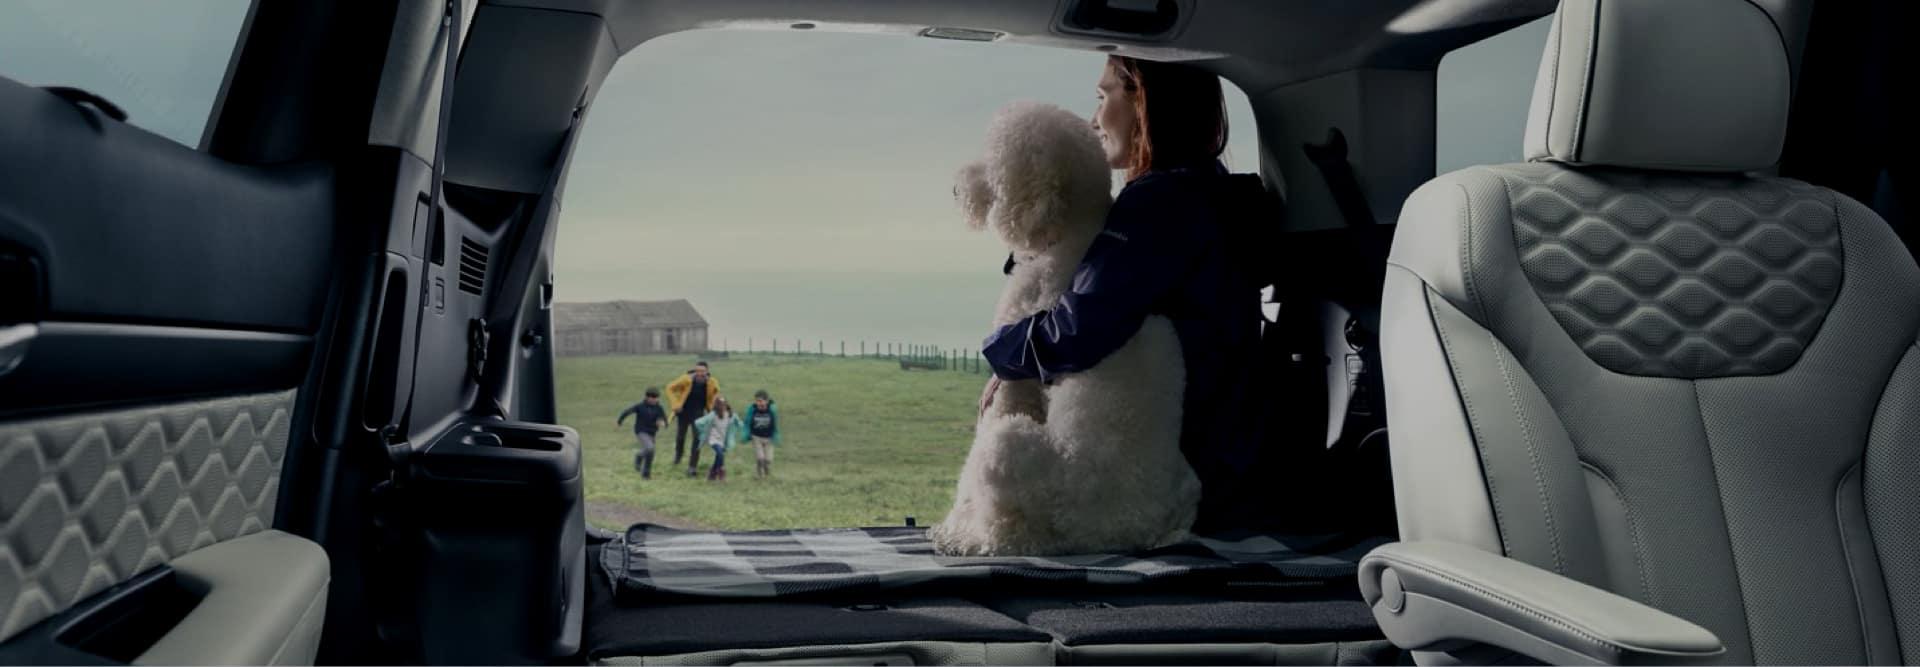 Family sitting inside SUV